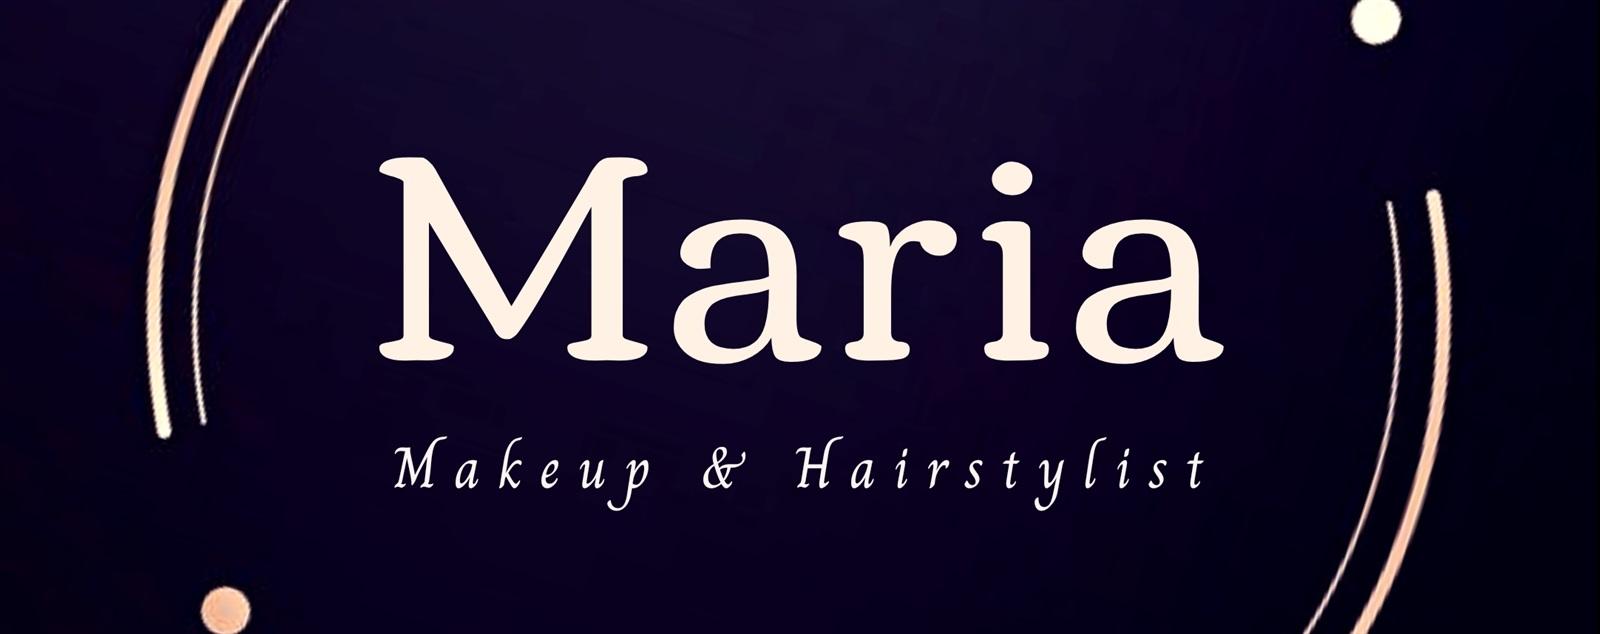 Maria Hairdo & Makeup Artist